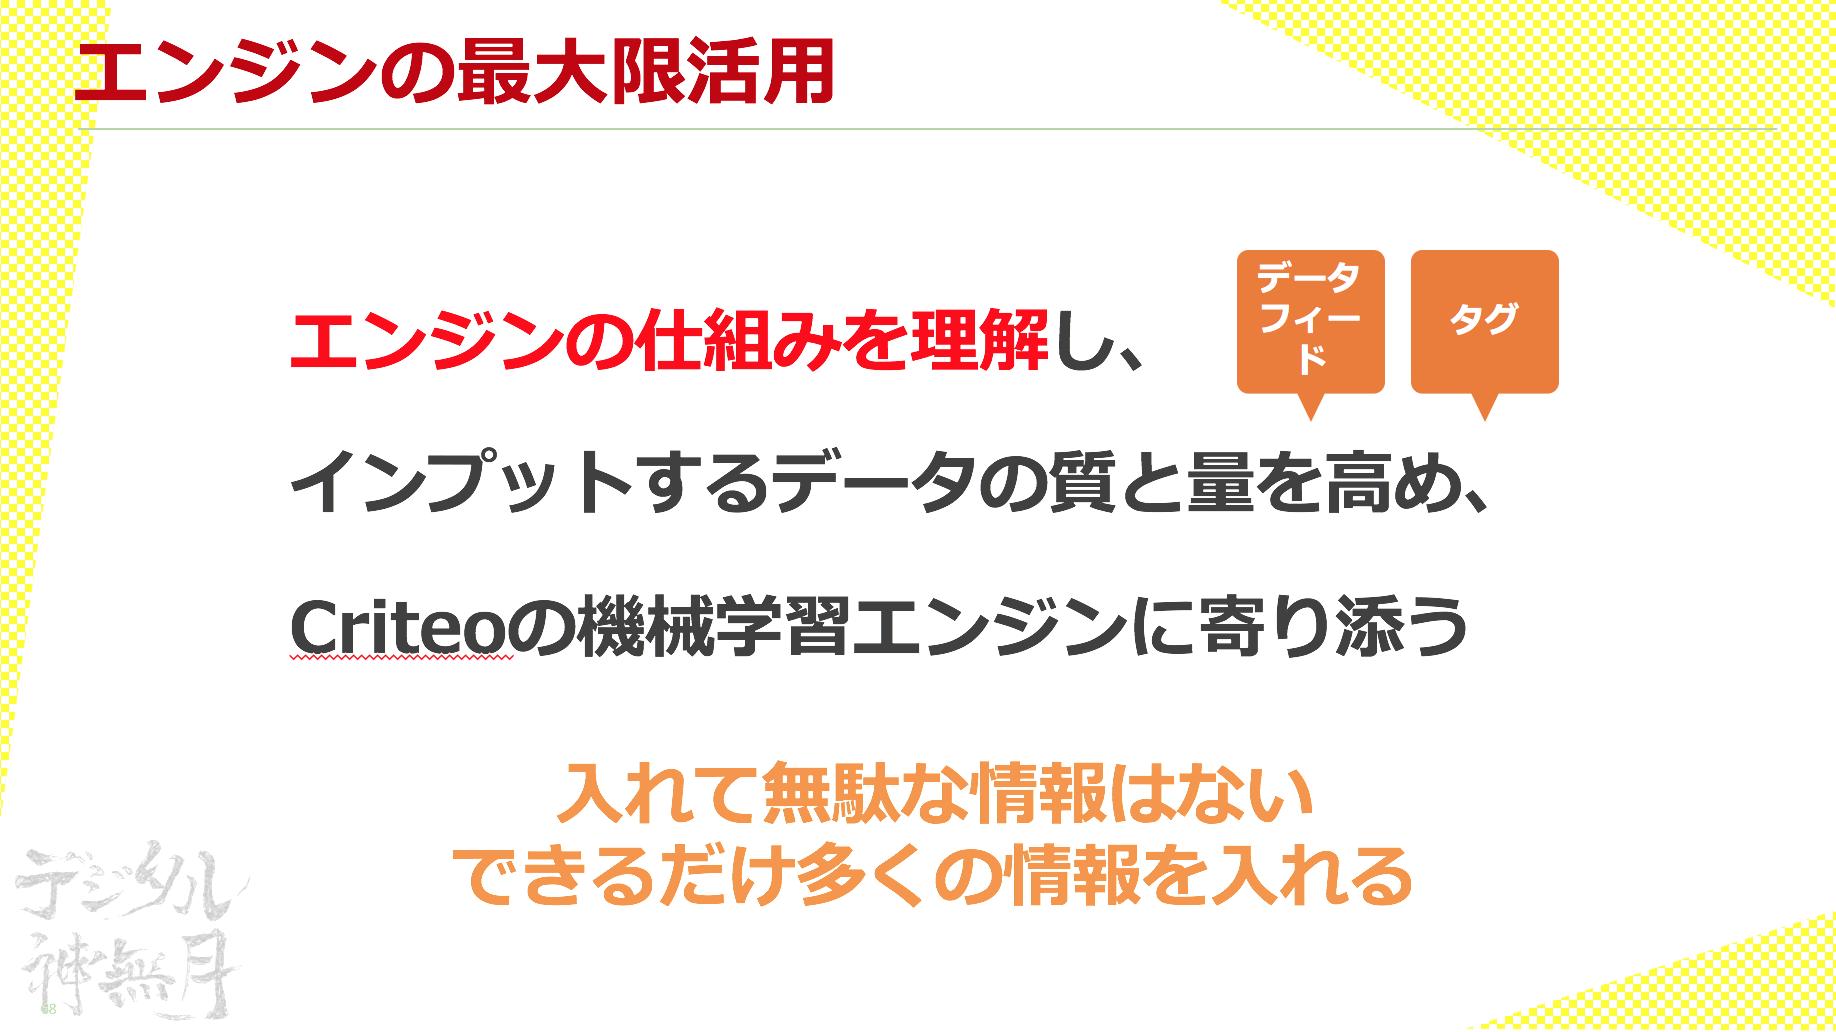 kannazuki-09